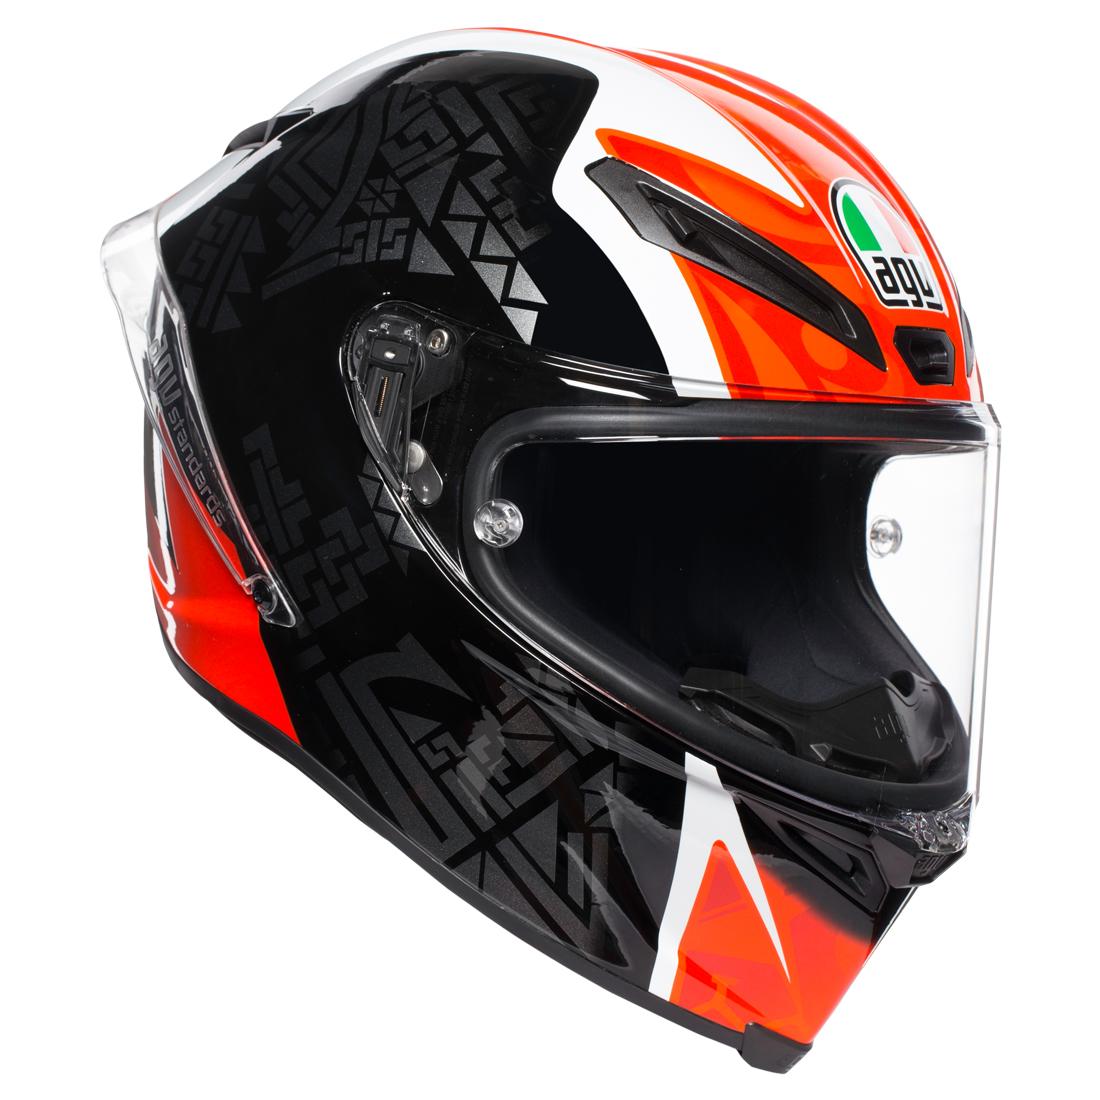 AGV フルフェイスヘルメット CORSA R 004-CASANOVA XLサイズ